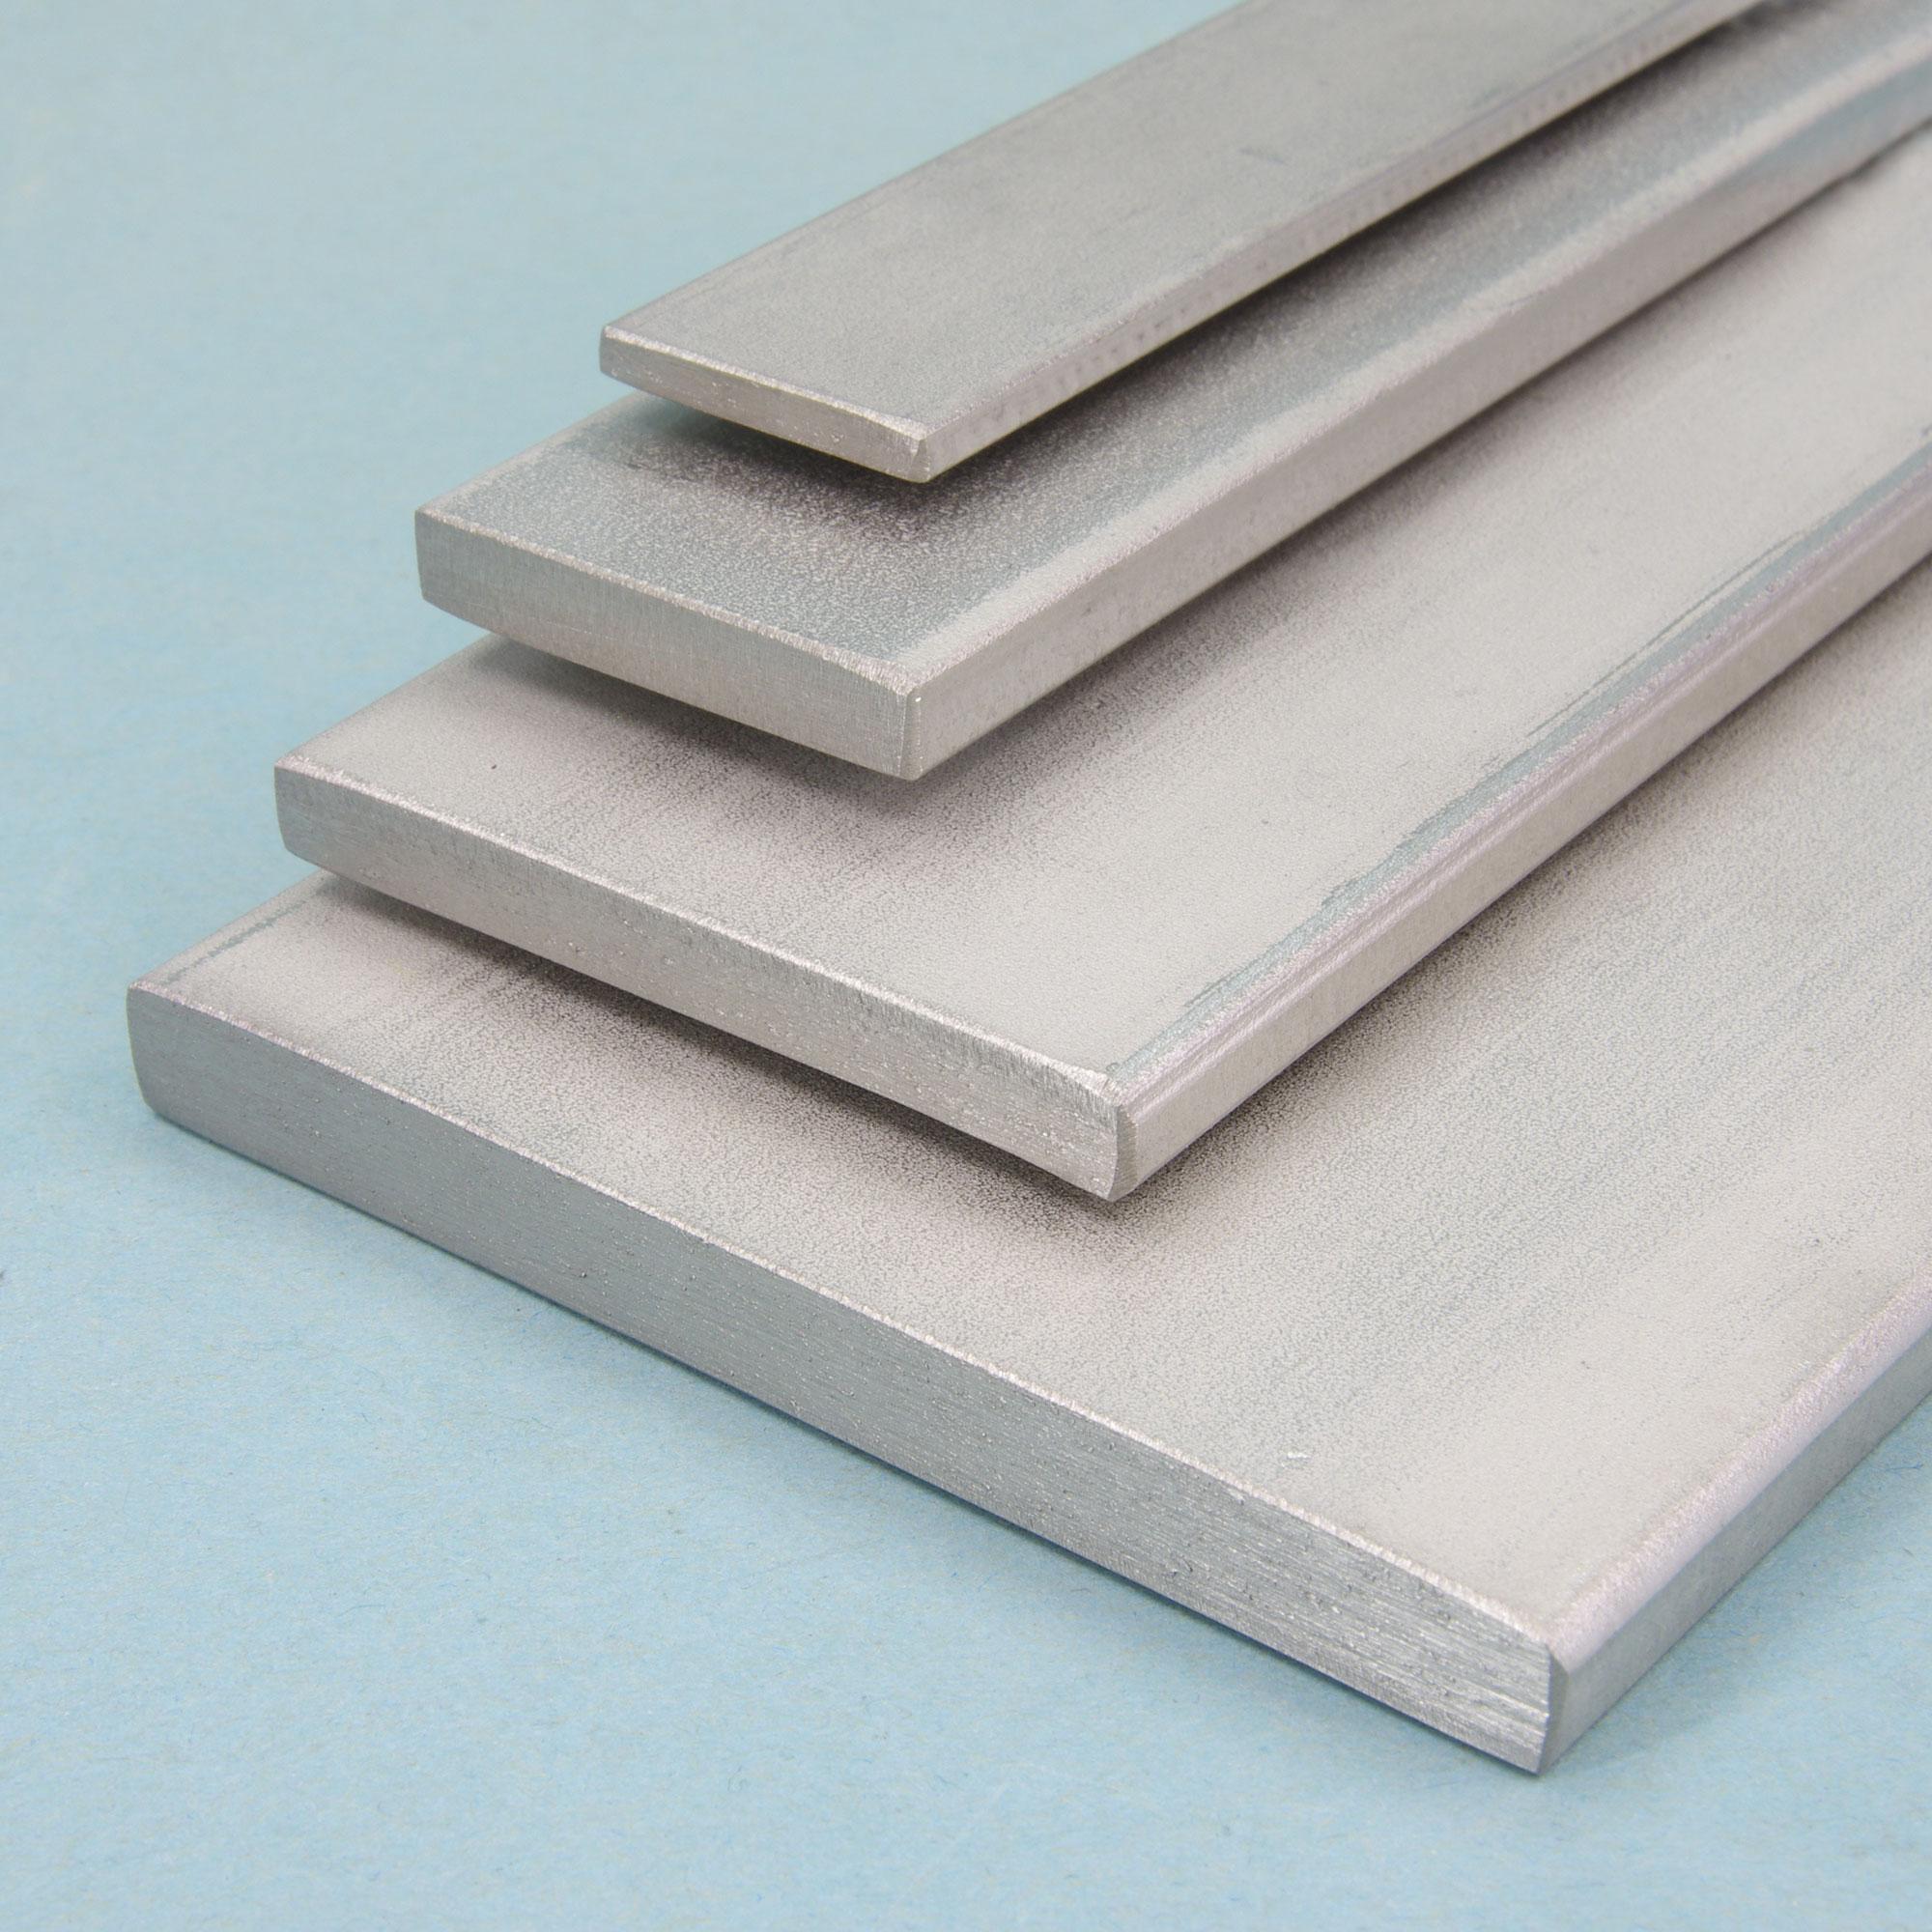 Aluminium Flachstange 120x20mm Länge wählbar Alu Flachmaterial AlCuMgPb Flach